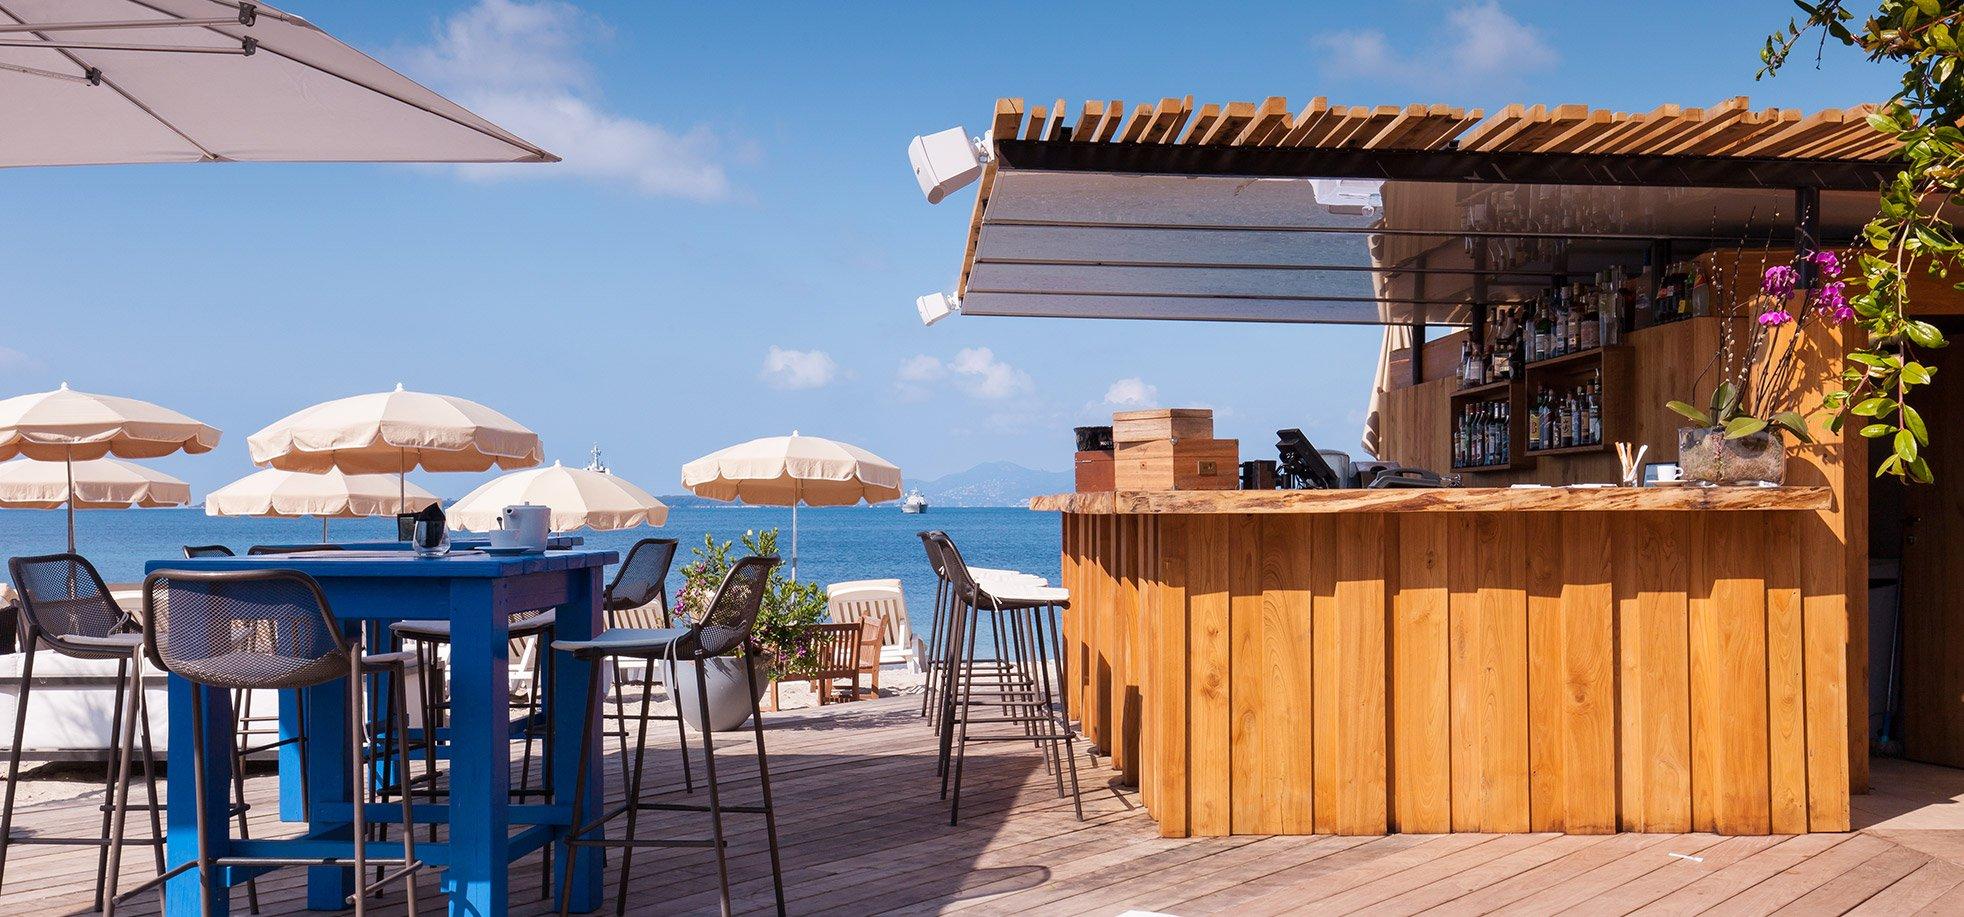 luxury-beach-hotel-antibes-france